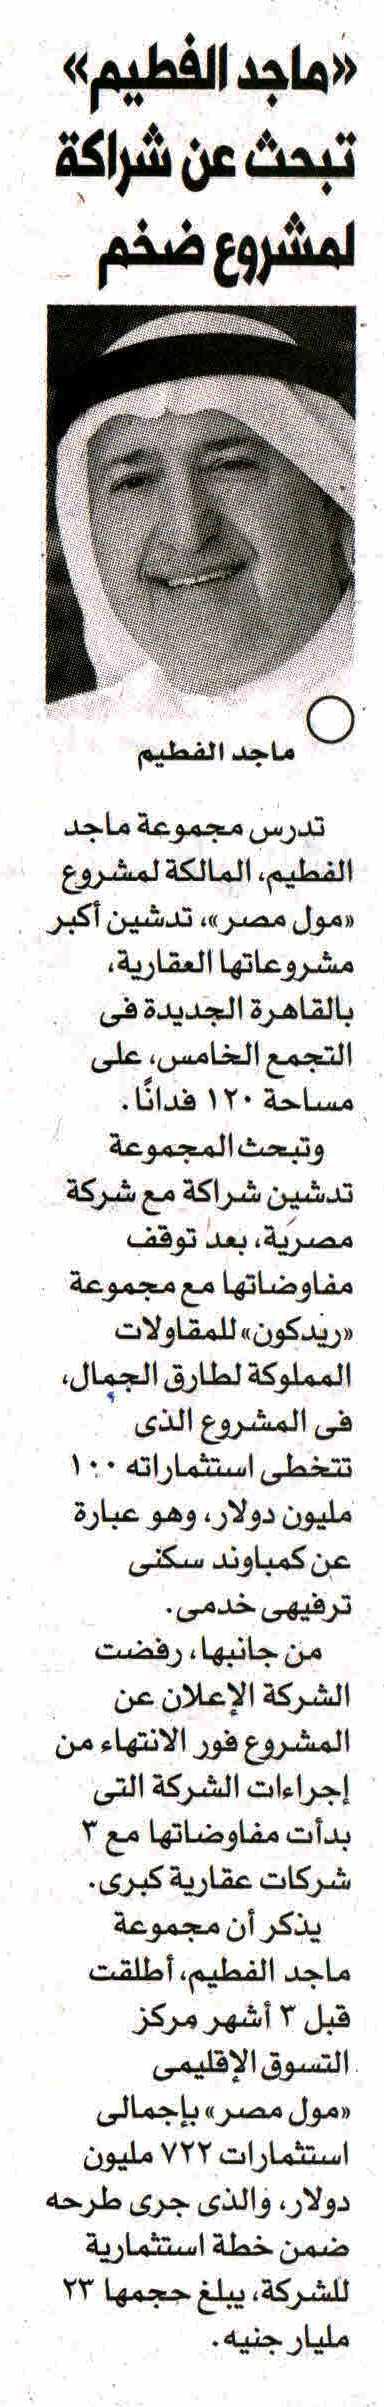 Al Dustor 4 June P.14.jpg